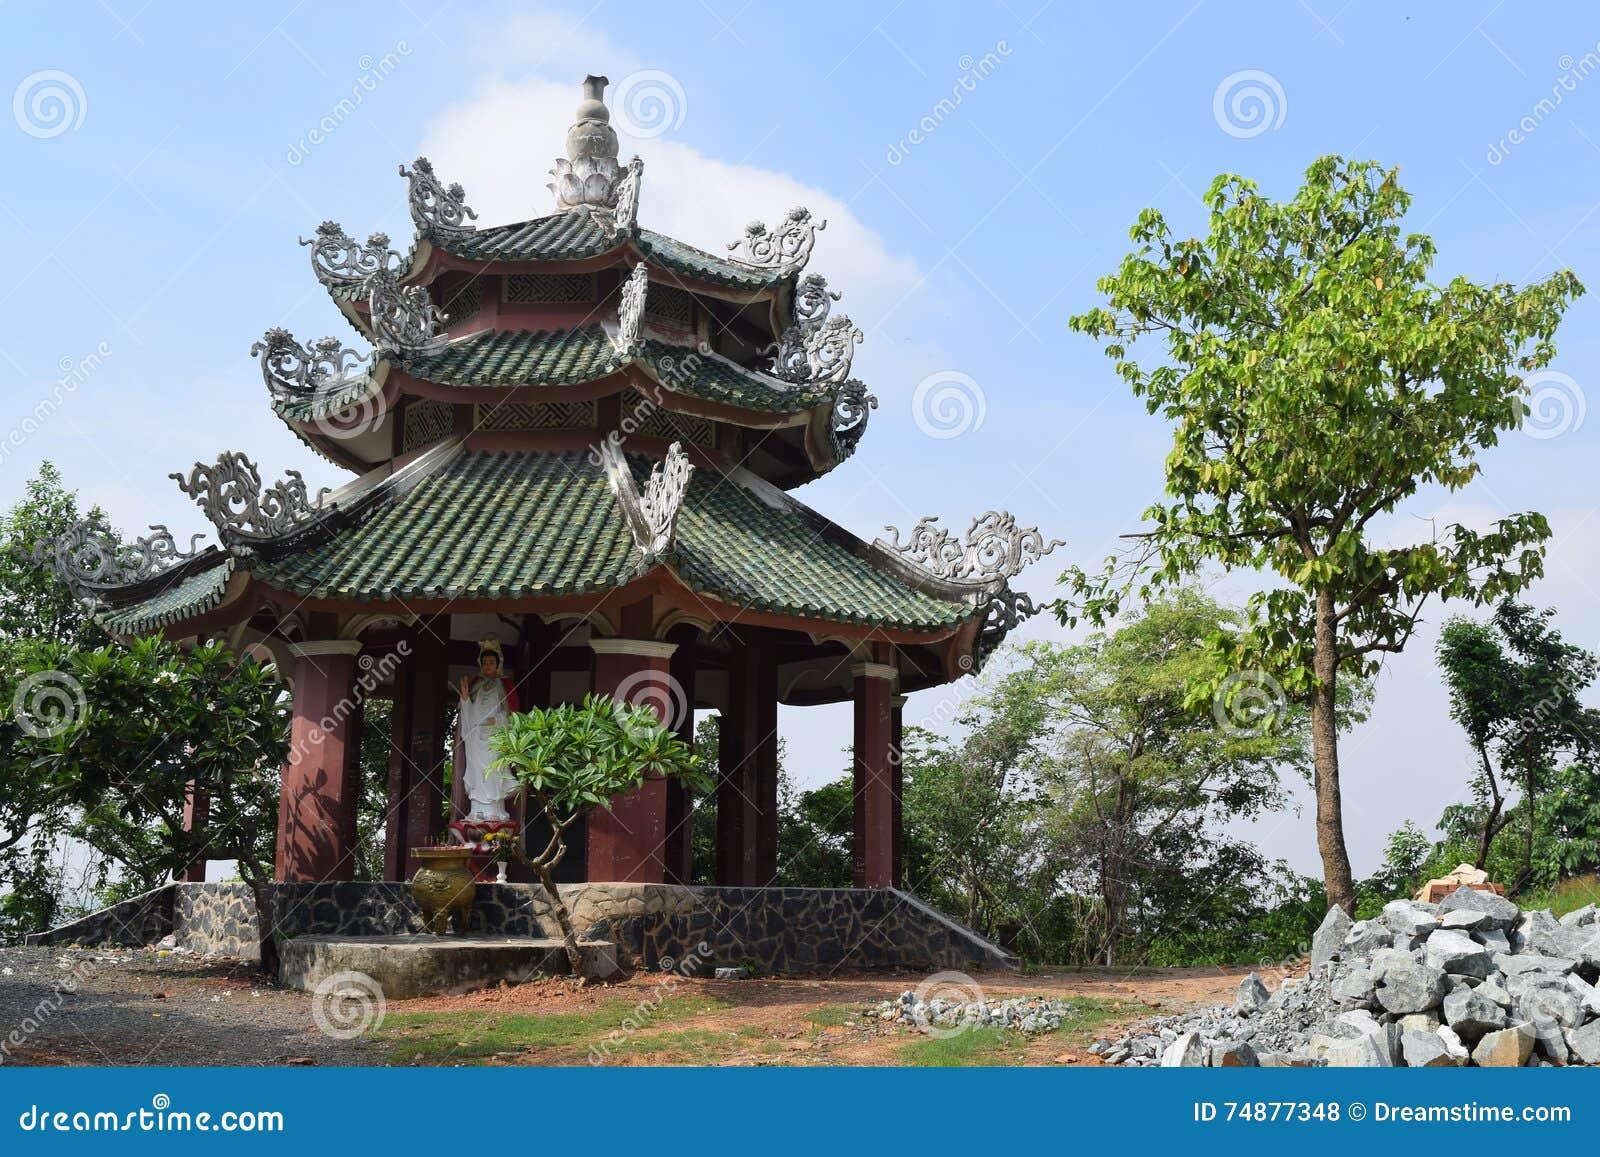 Templo de Chau Thoi na província de Binh Duong, Vietname